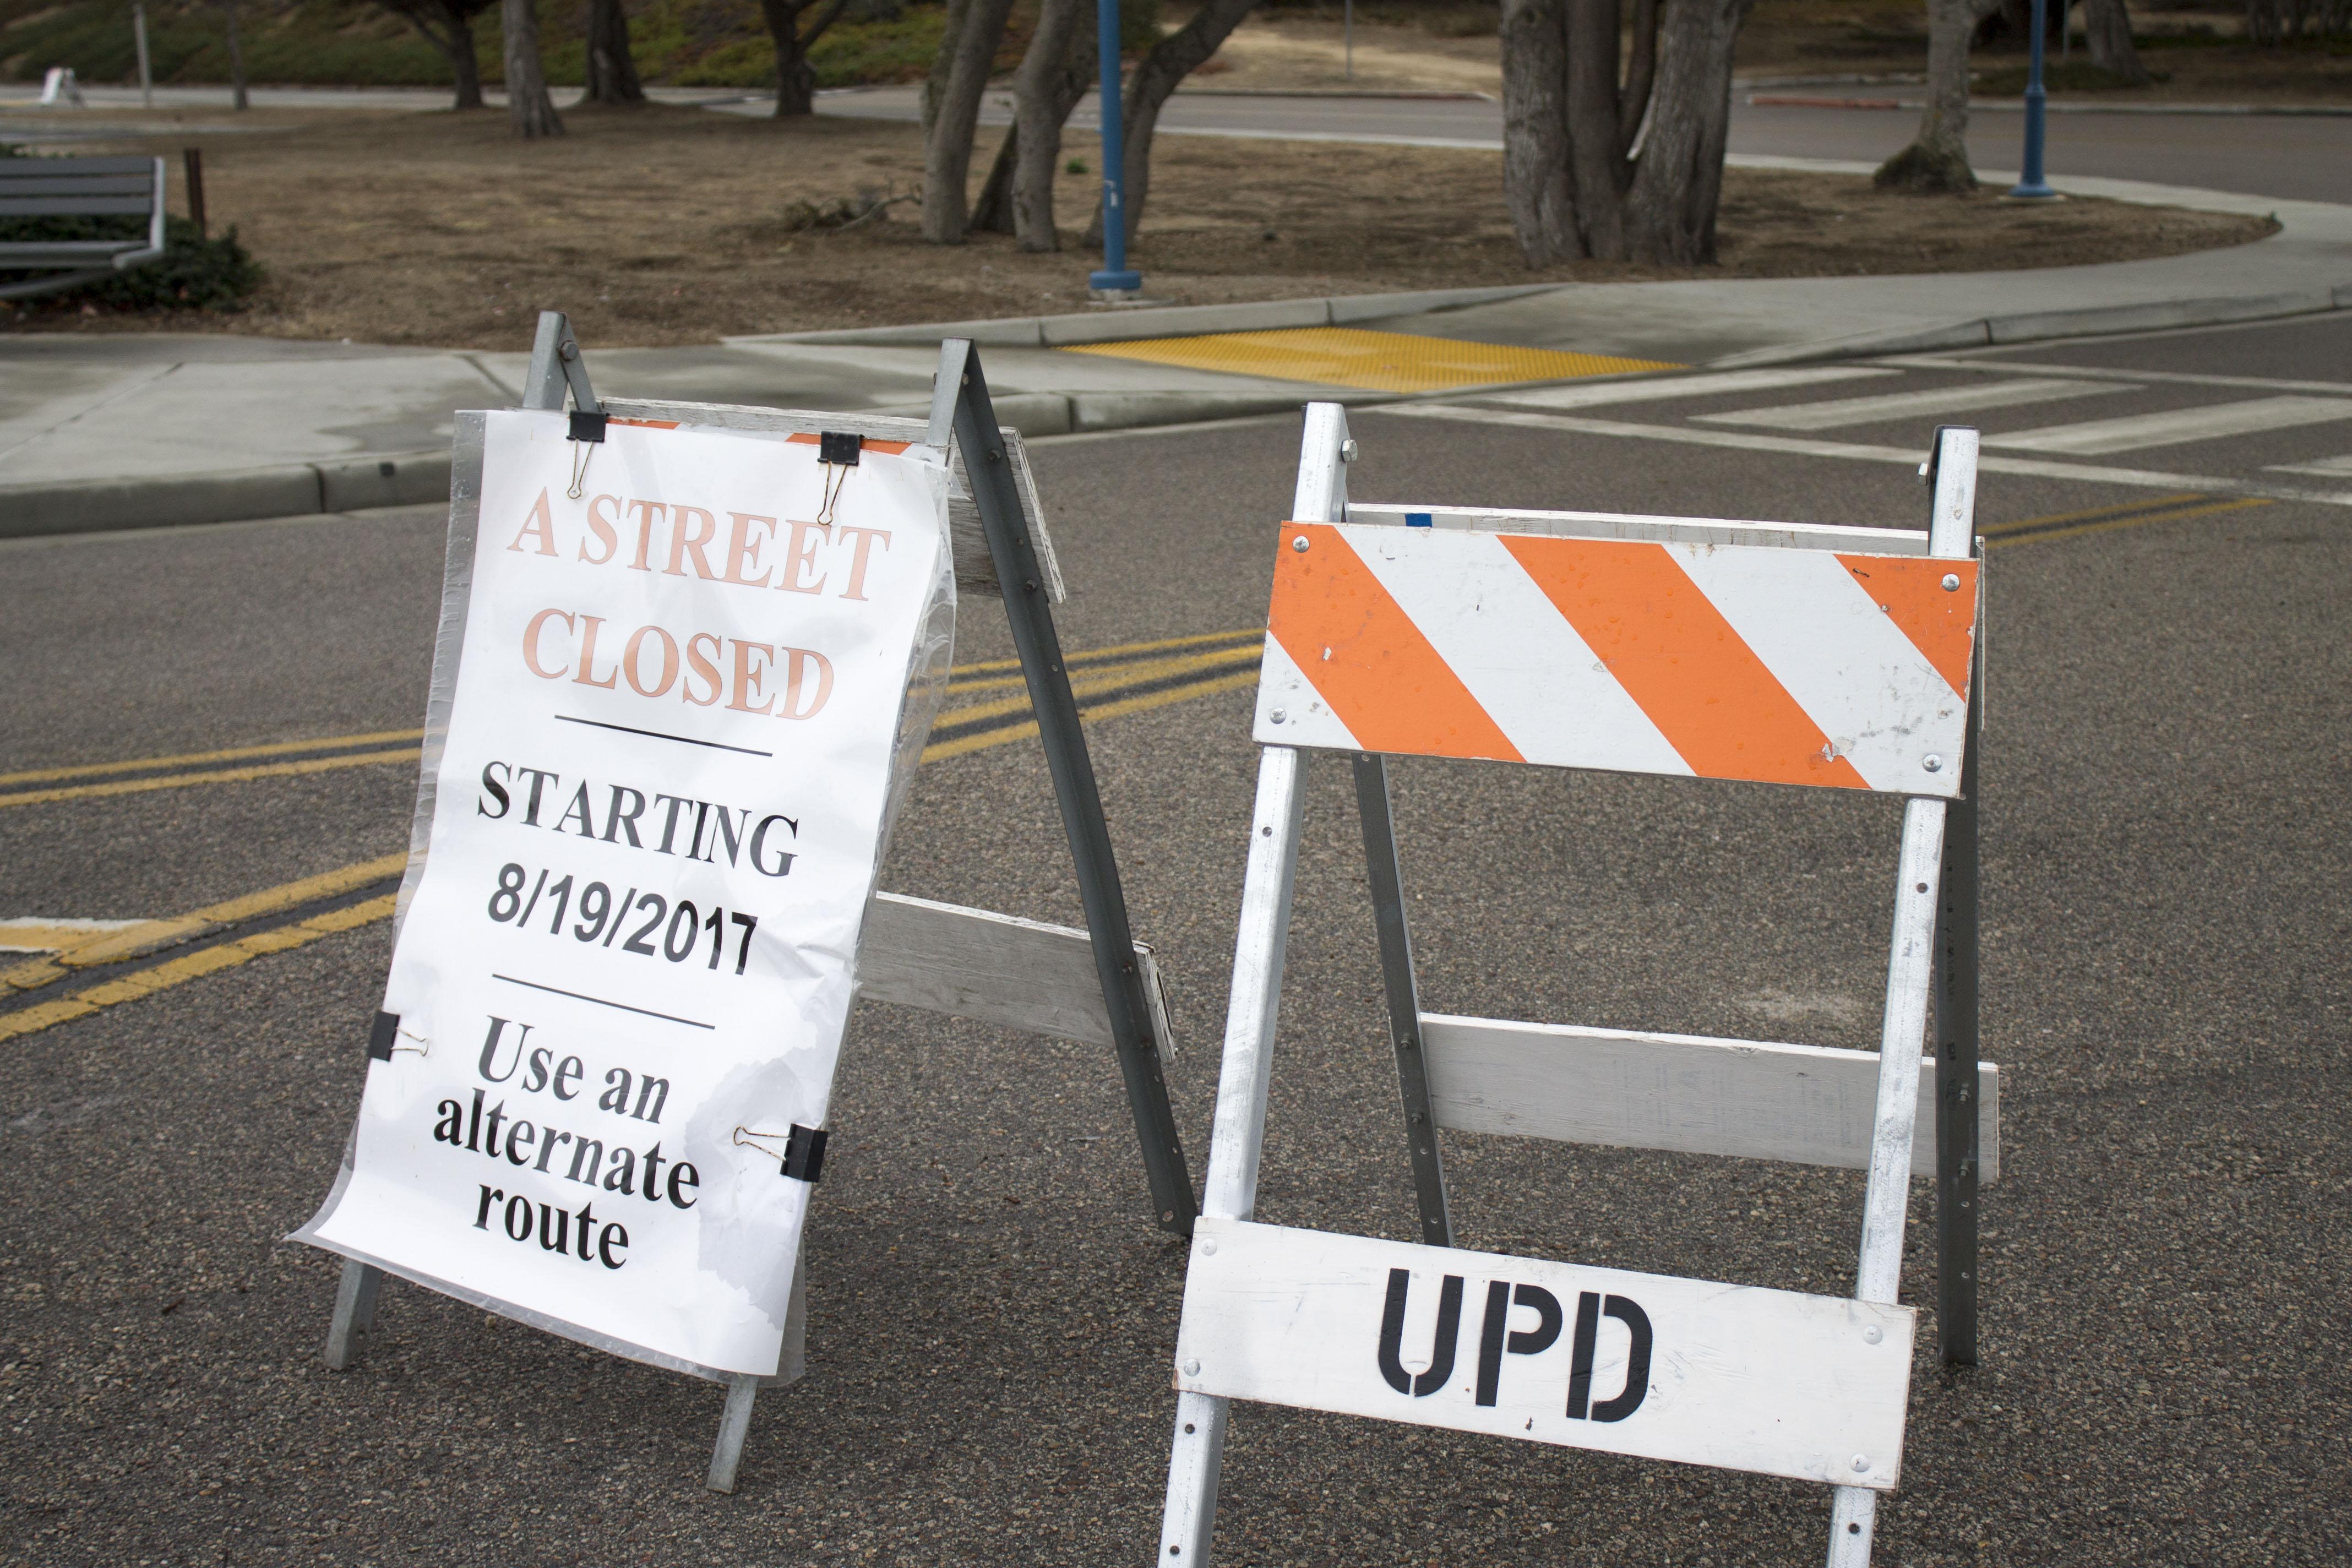 Street closure signs.